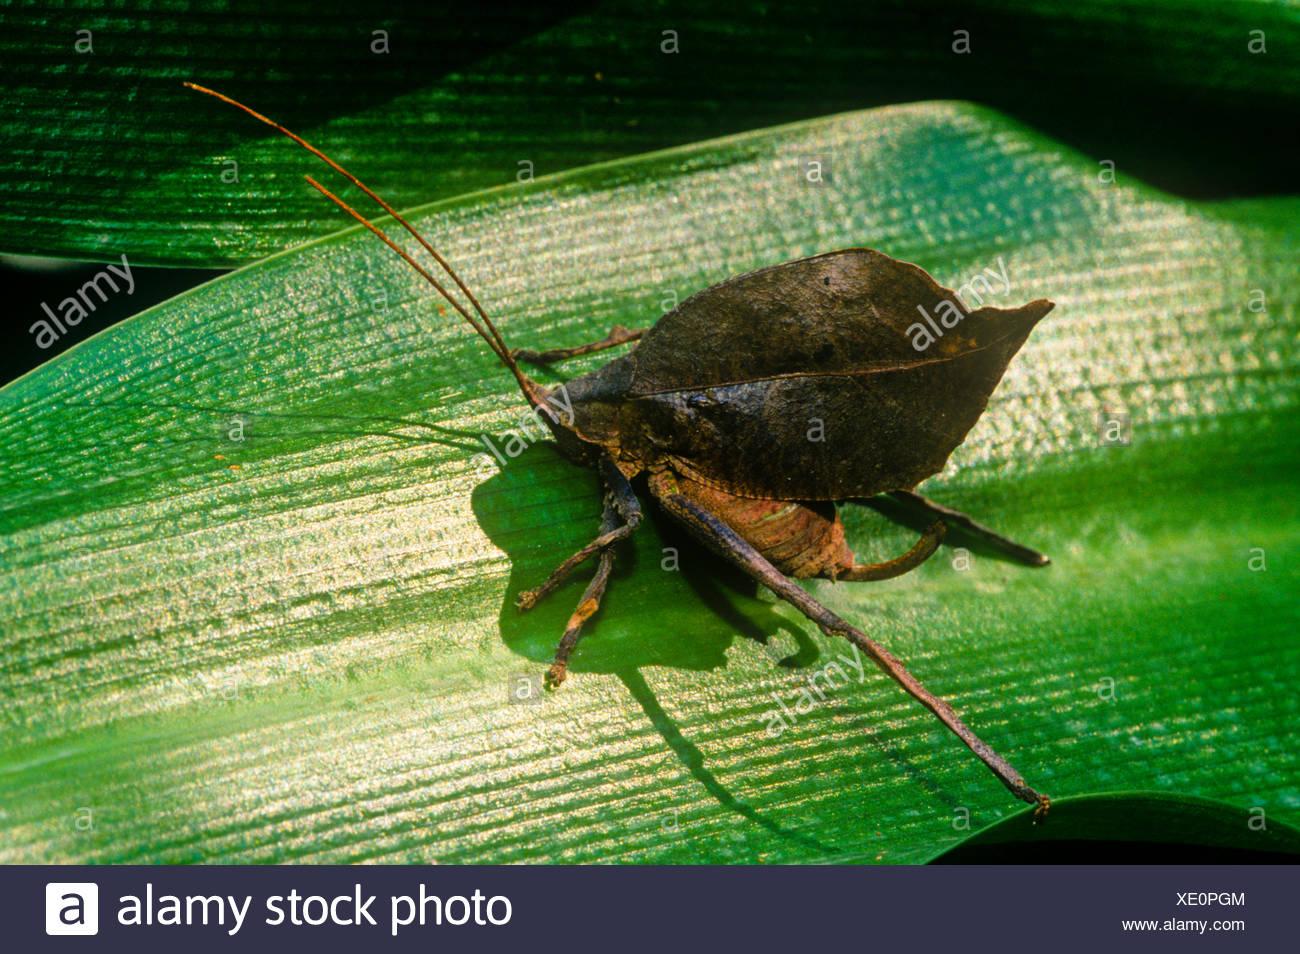 Tote Blätter nachahmen Grashuepfer, Typophyllum SP. (Tettigoniidae), getarntes braun, Costa Rica. Stockbild